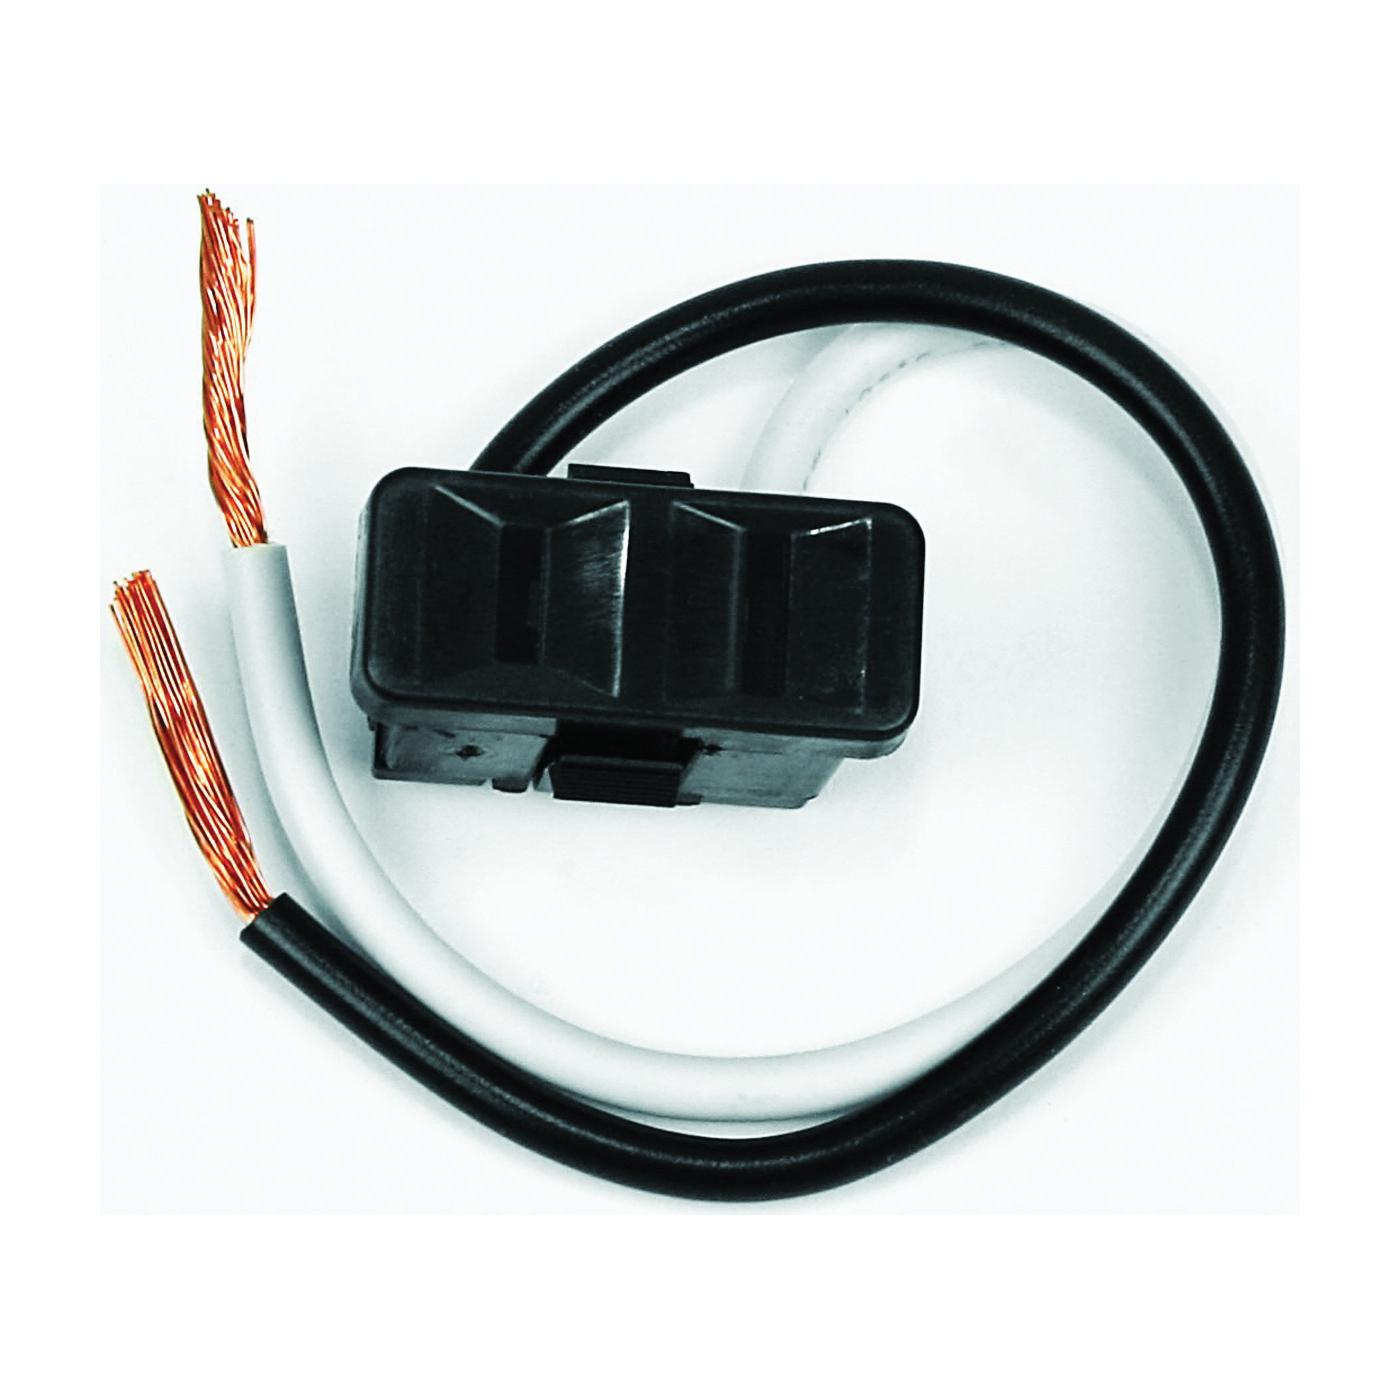 Picture of Jandorf 61014 Single Receptacle, 2-Pole, 125 V, 15 A, Black